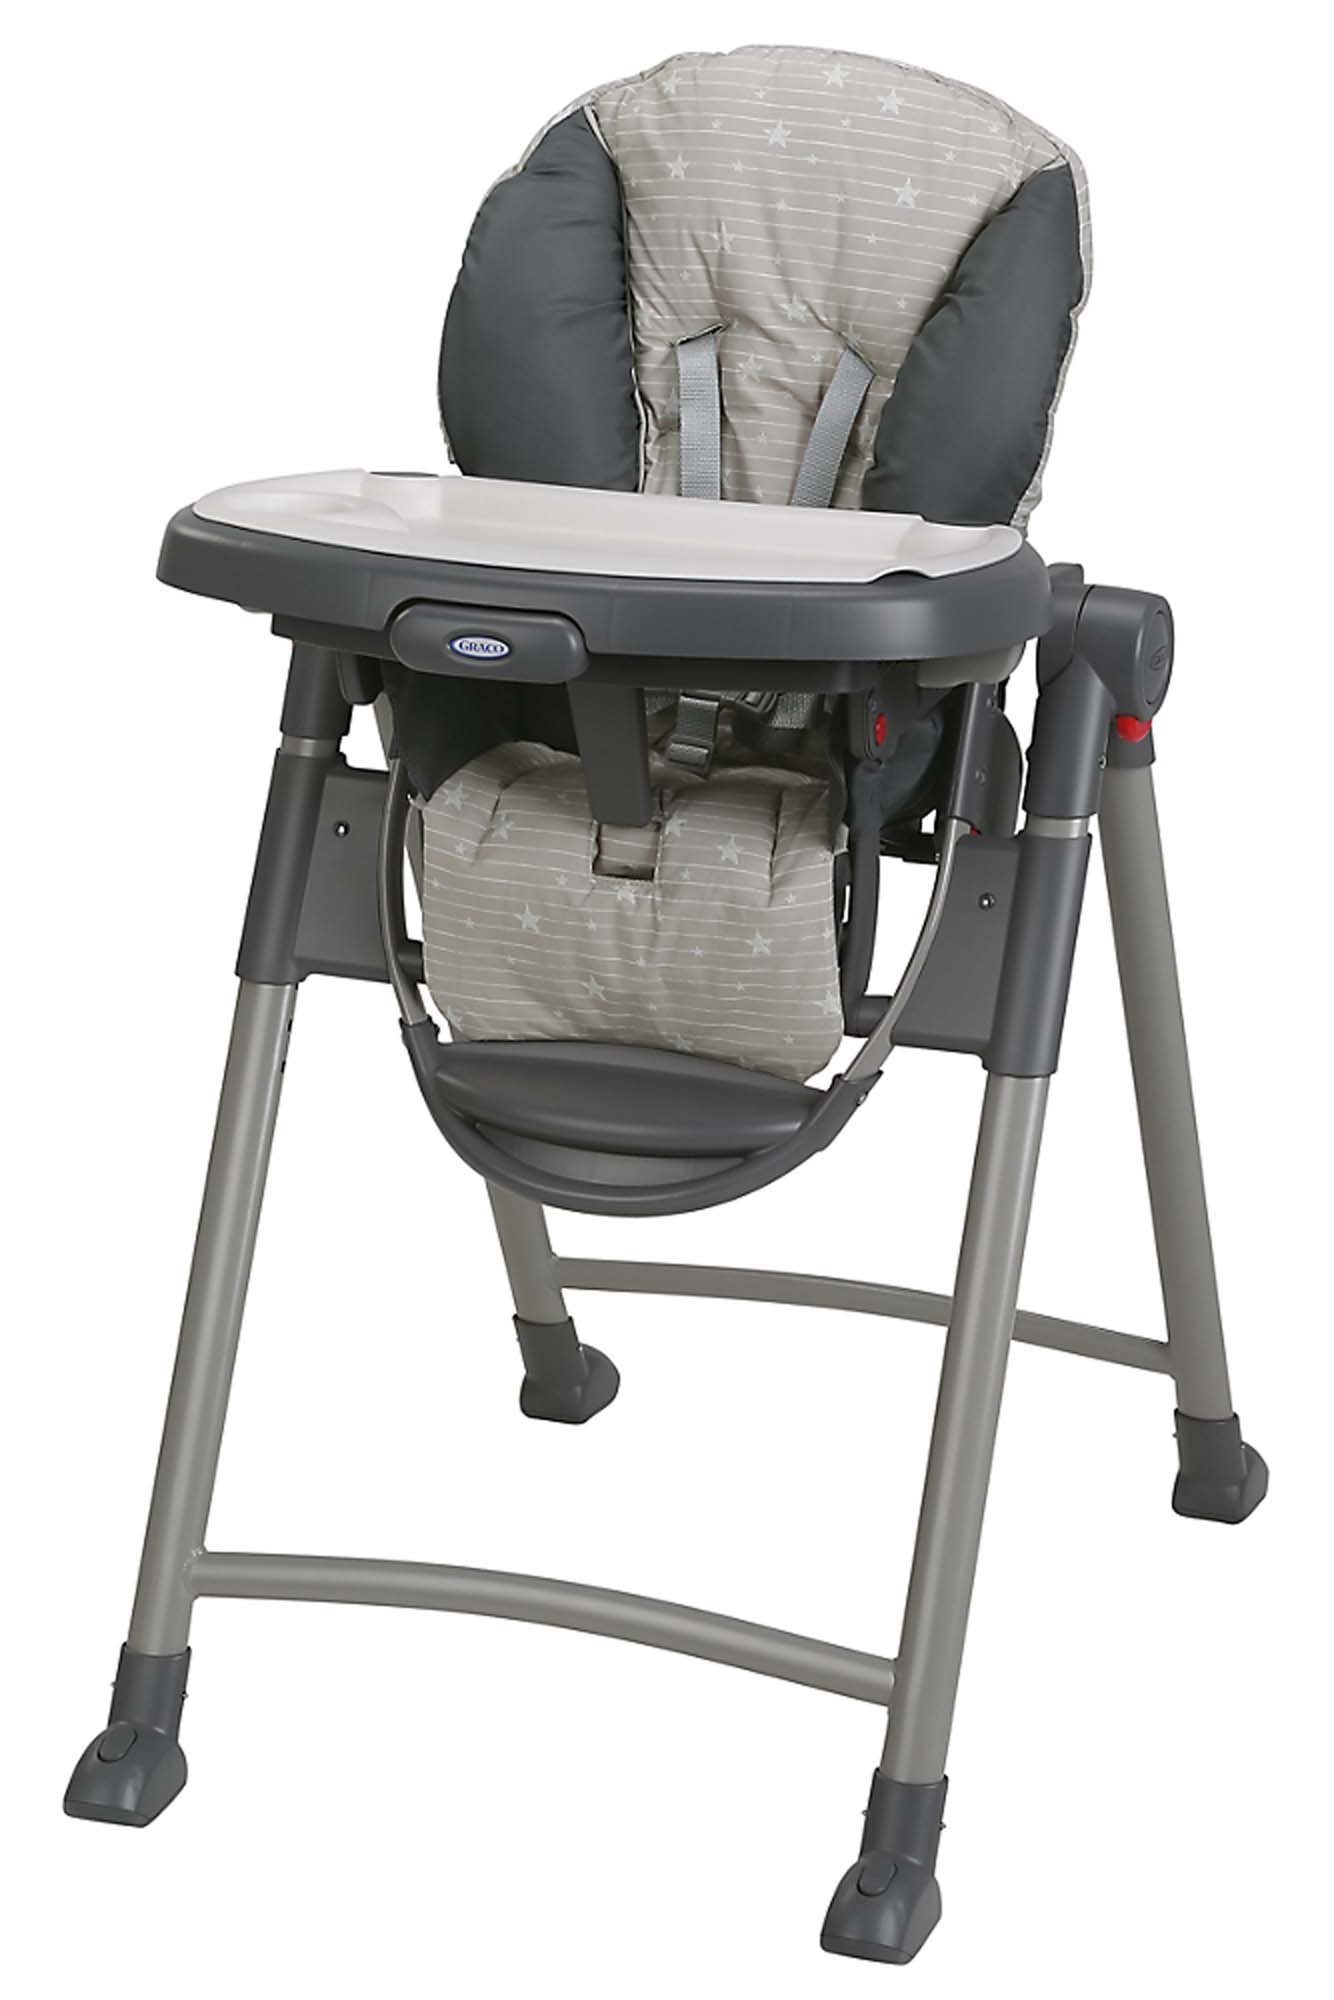 Graco Contempo High Chair, Stars